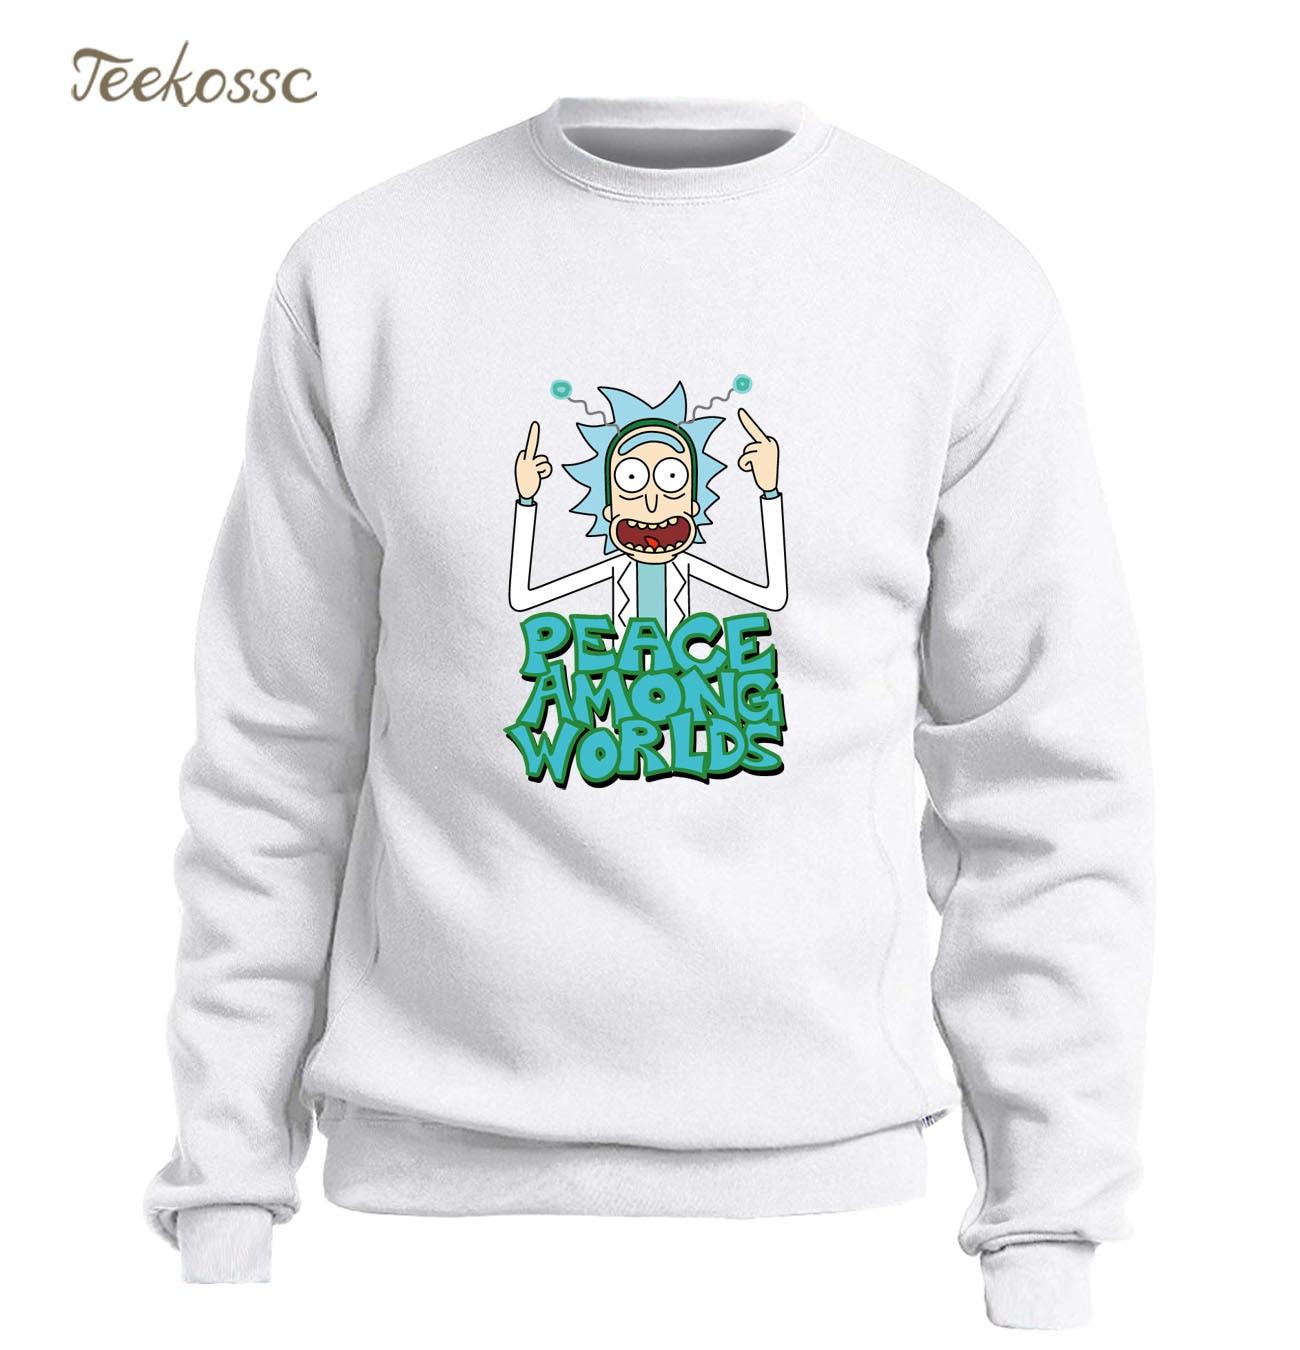 Peace Among Worlds Rick and Morty Sweatshirt Men White Hoodie Funny Sweatshirts Mens 2018 Winter Autumn Fleece Warm Streetwear